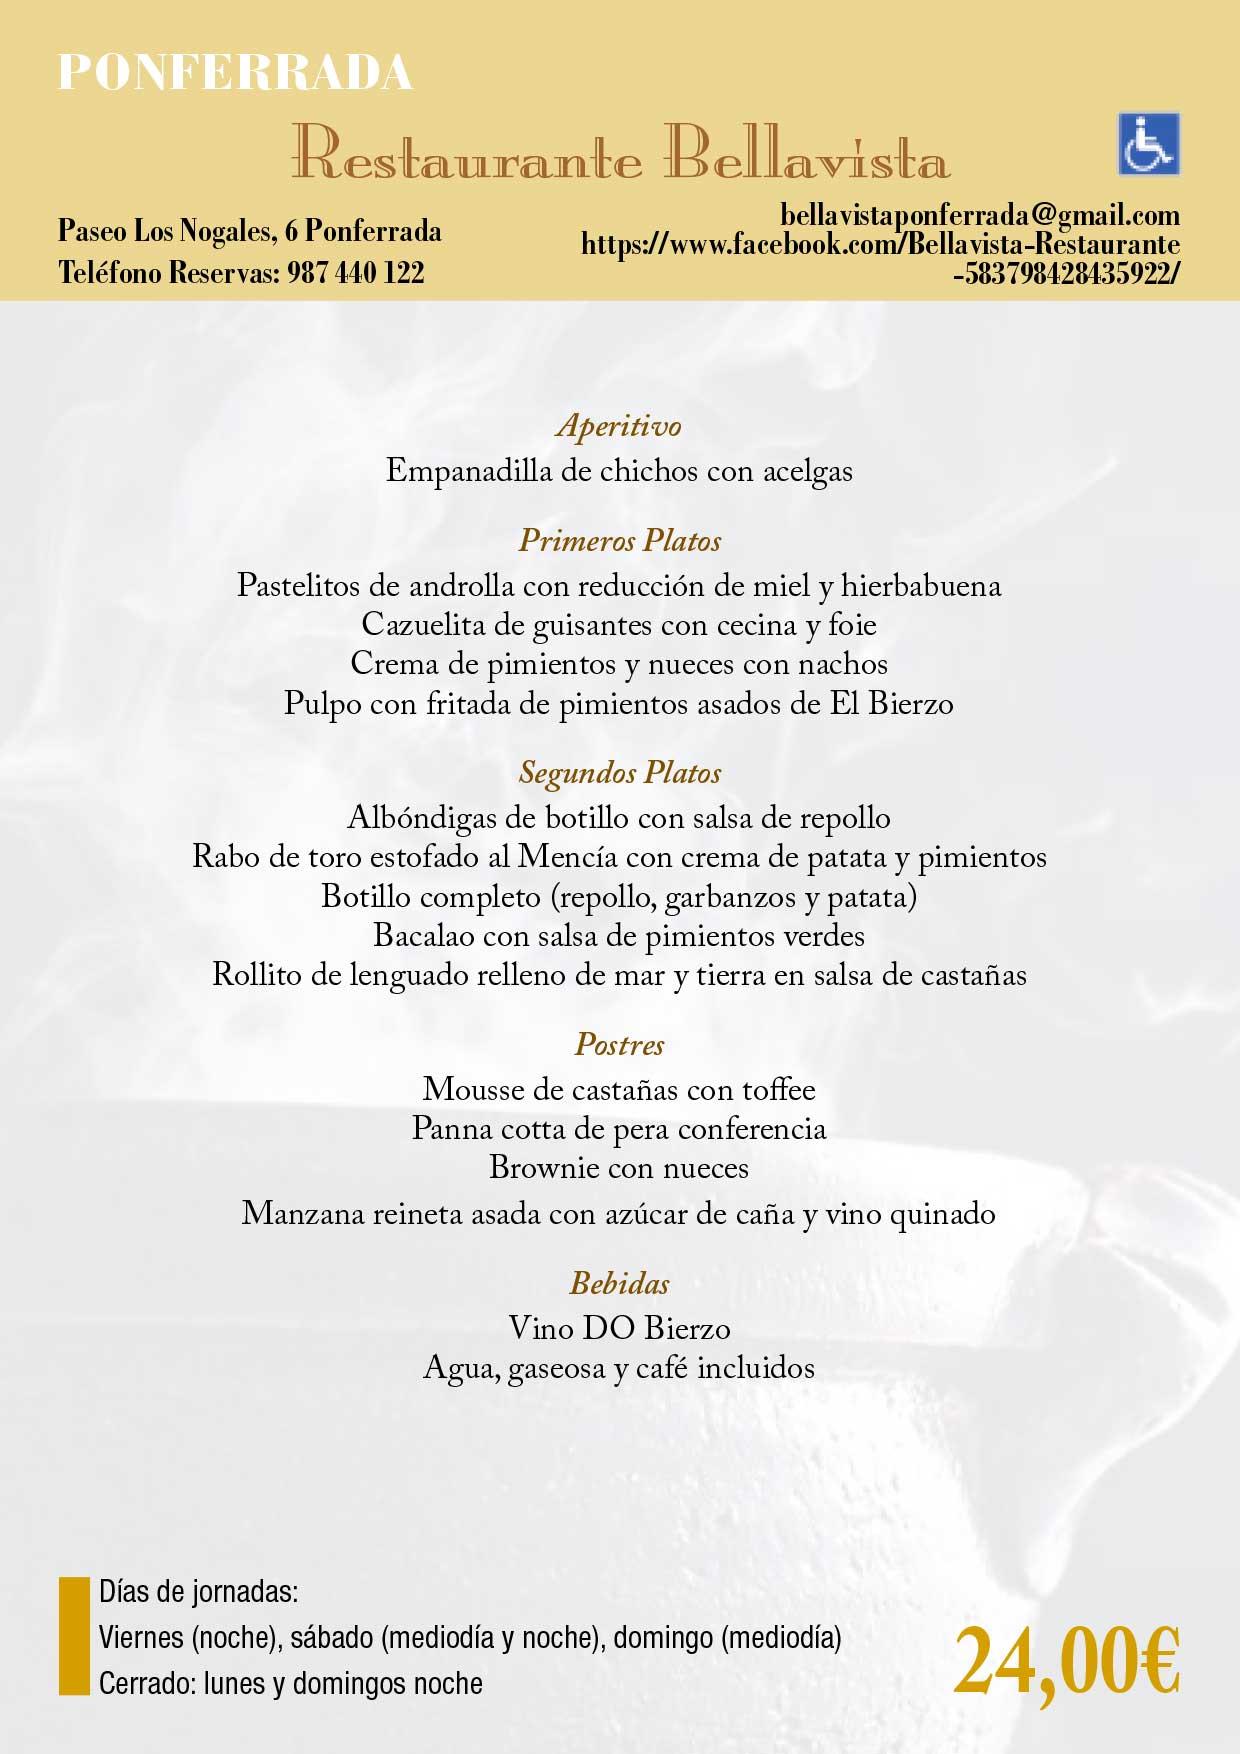 XXXIII Jornadas gastronómicas del Bierzo 2017. Restaurantes participantes 39